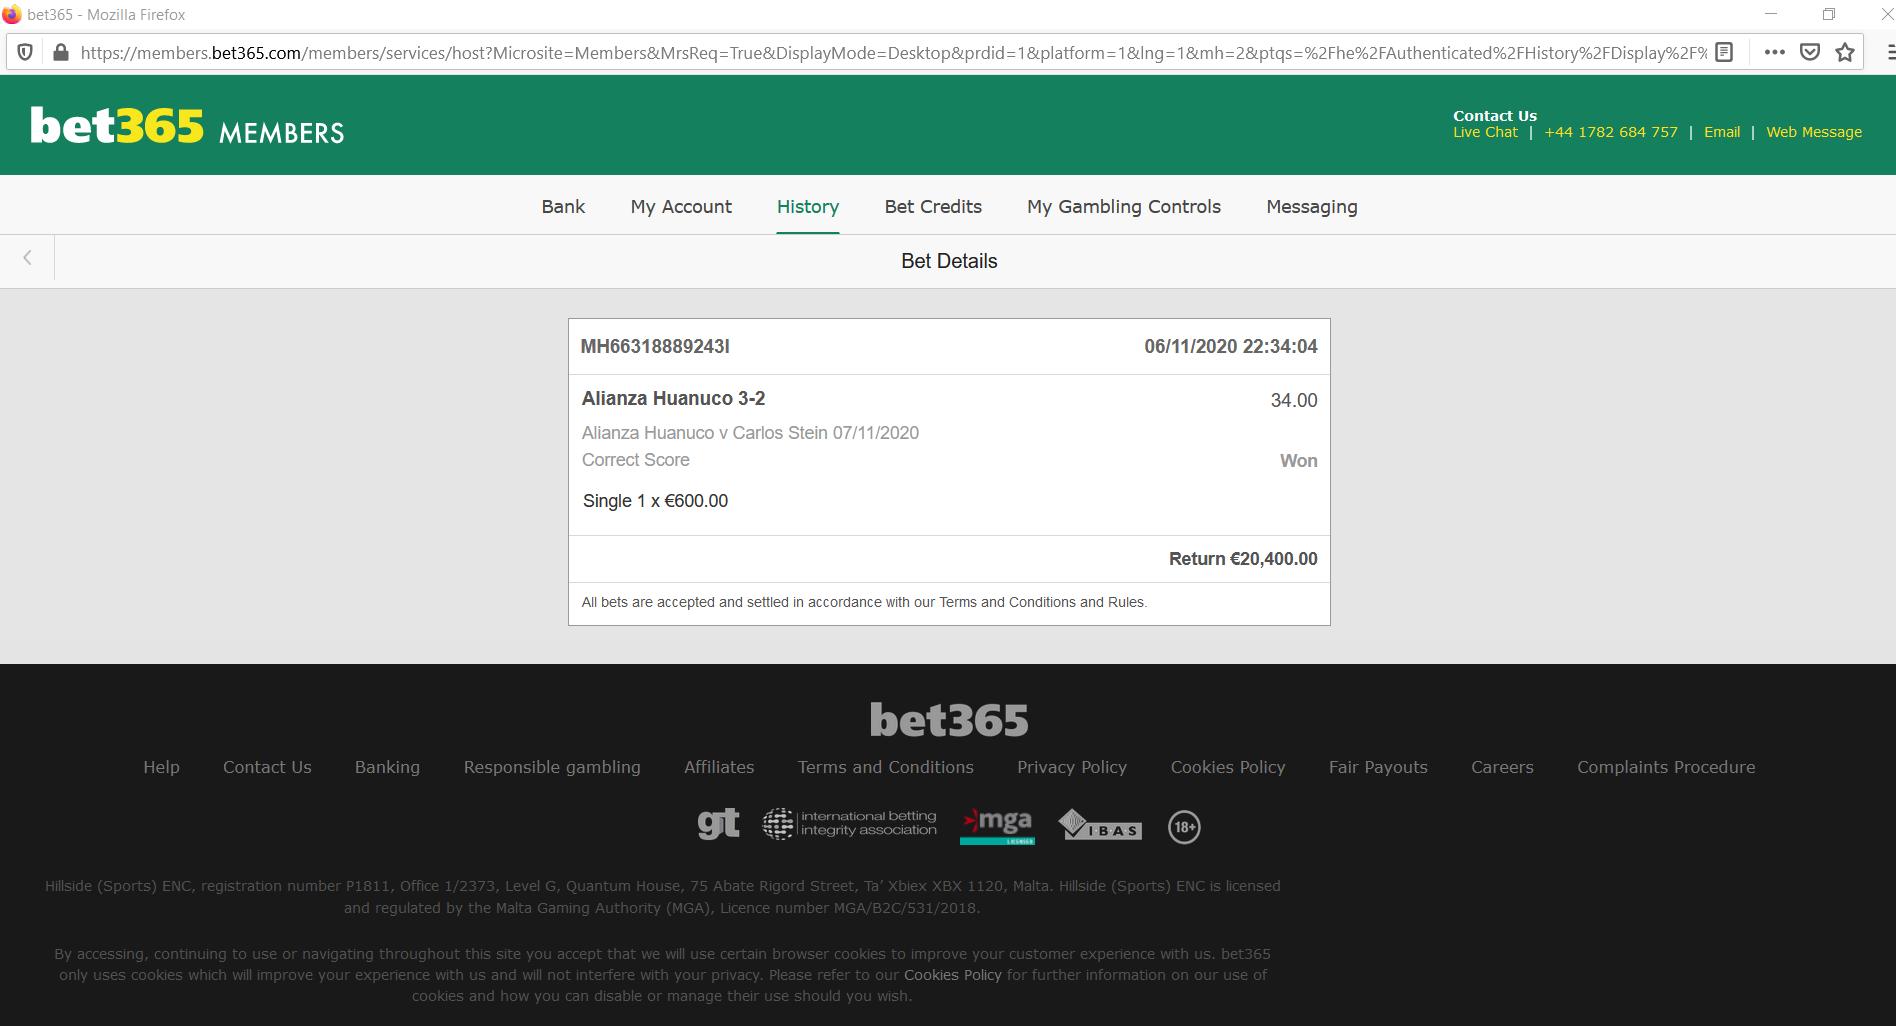 btts bettingclosed correct